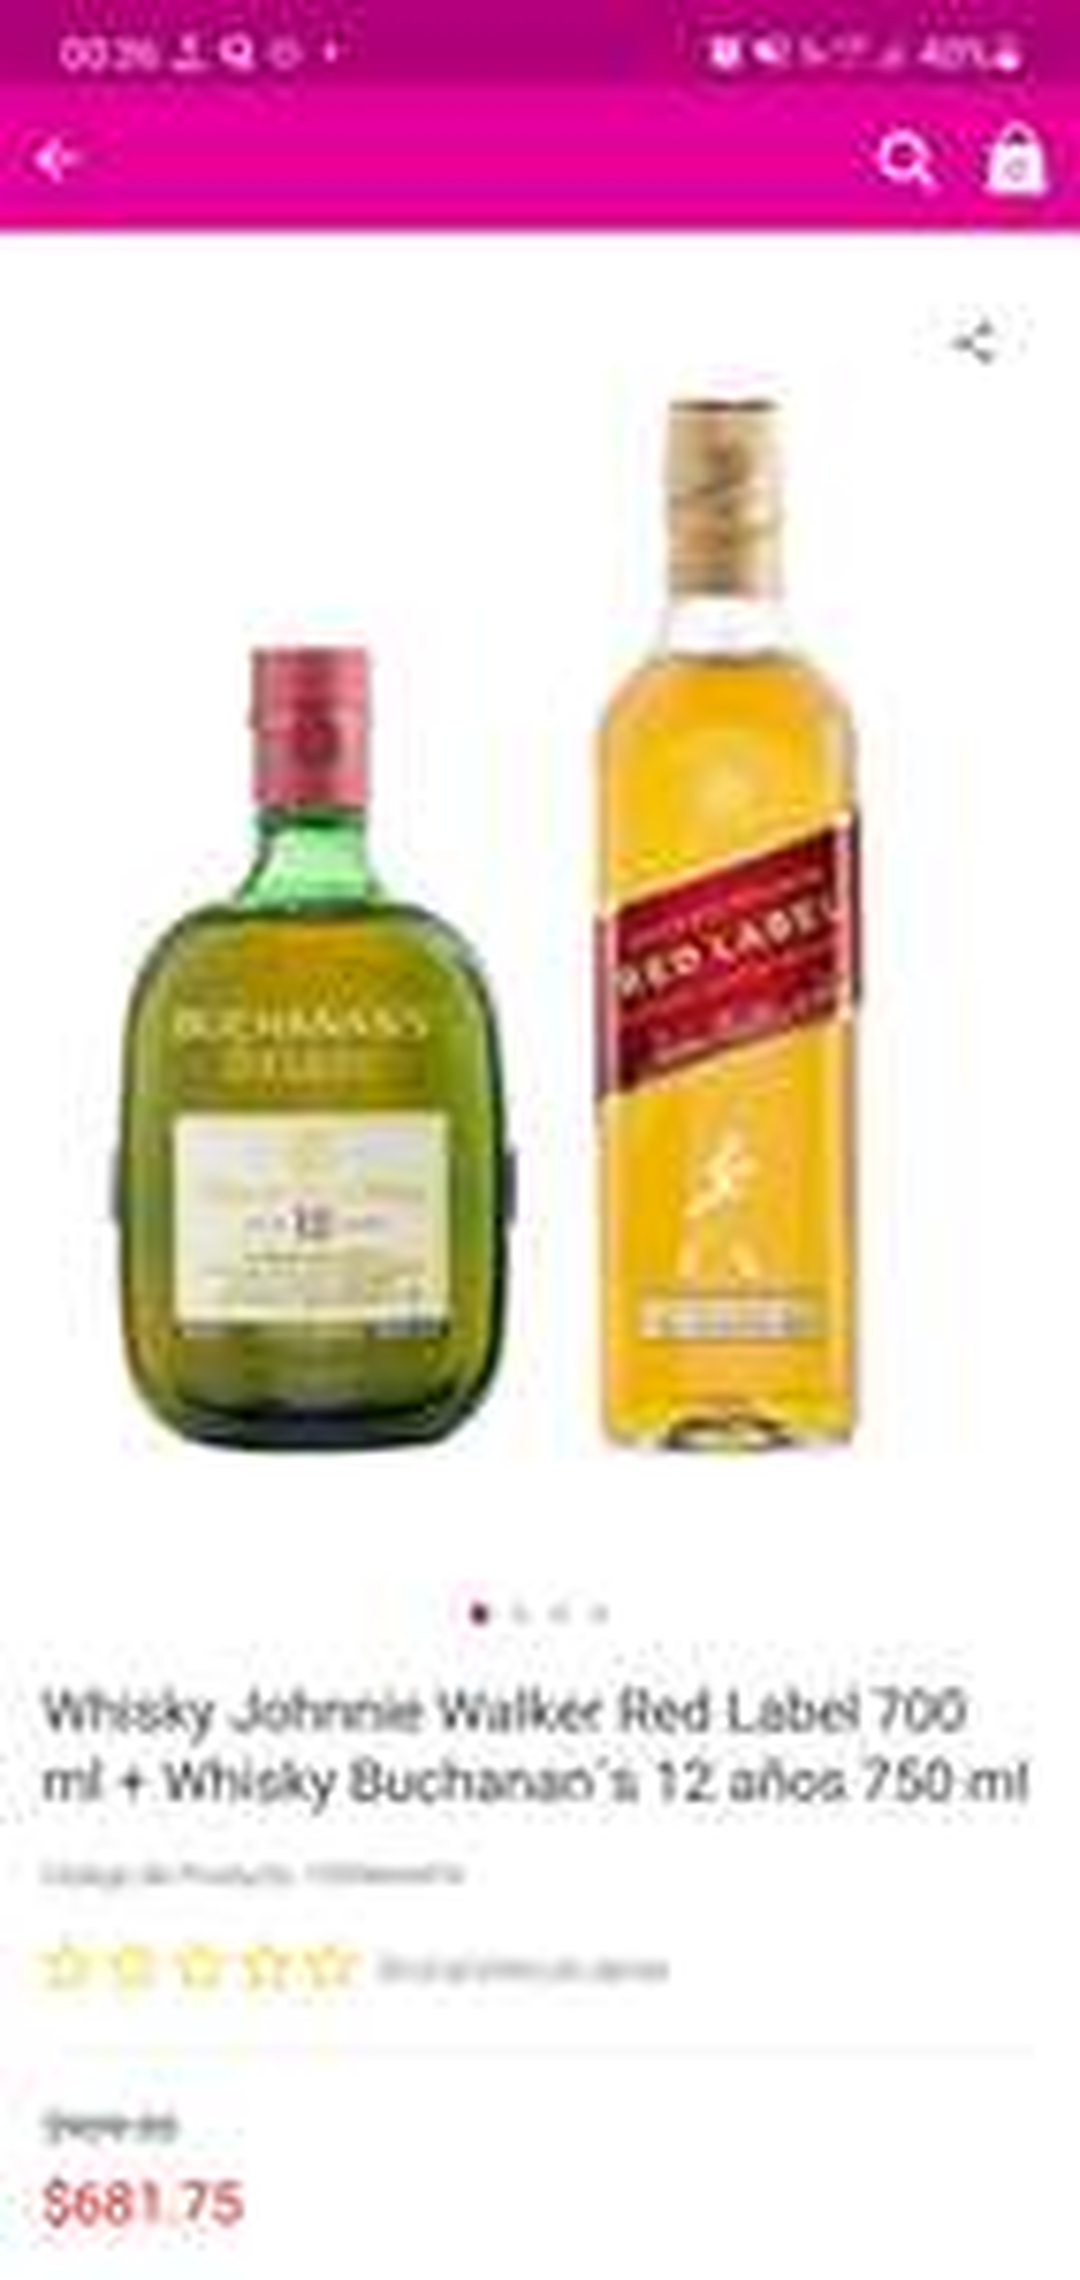 Liverpool: Red Label 700 ml + Whisky Buchanan´s 12 años 750 ml